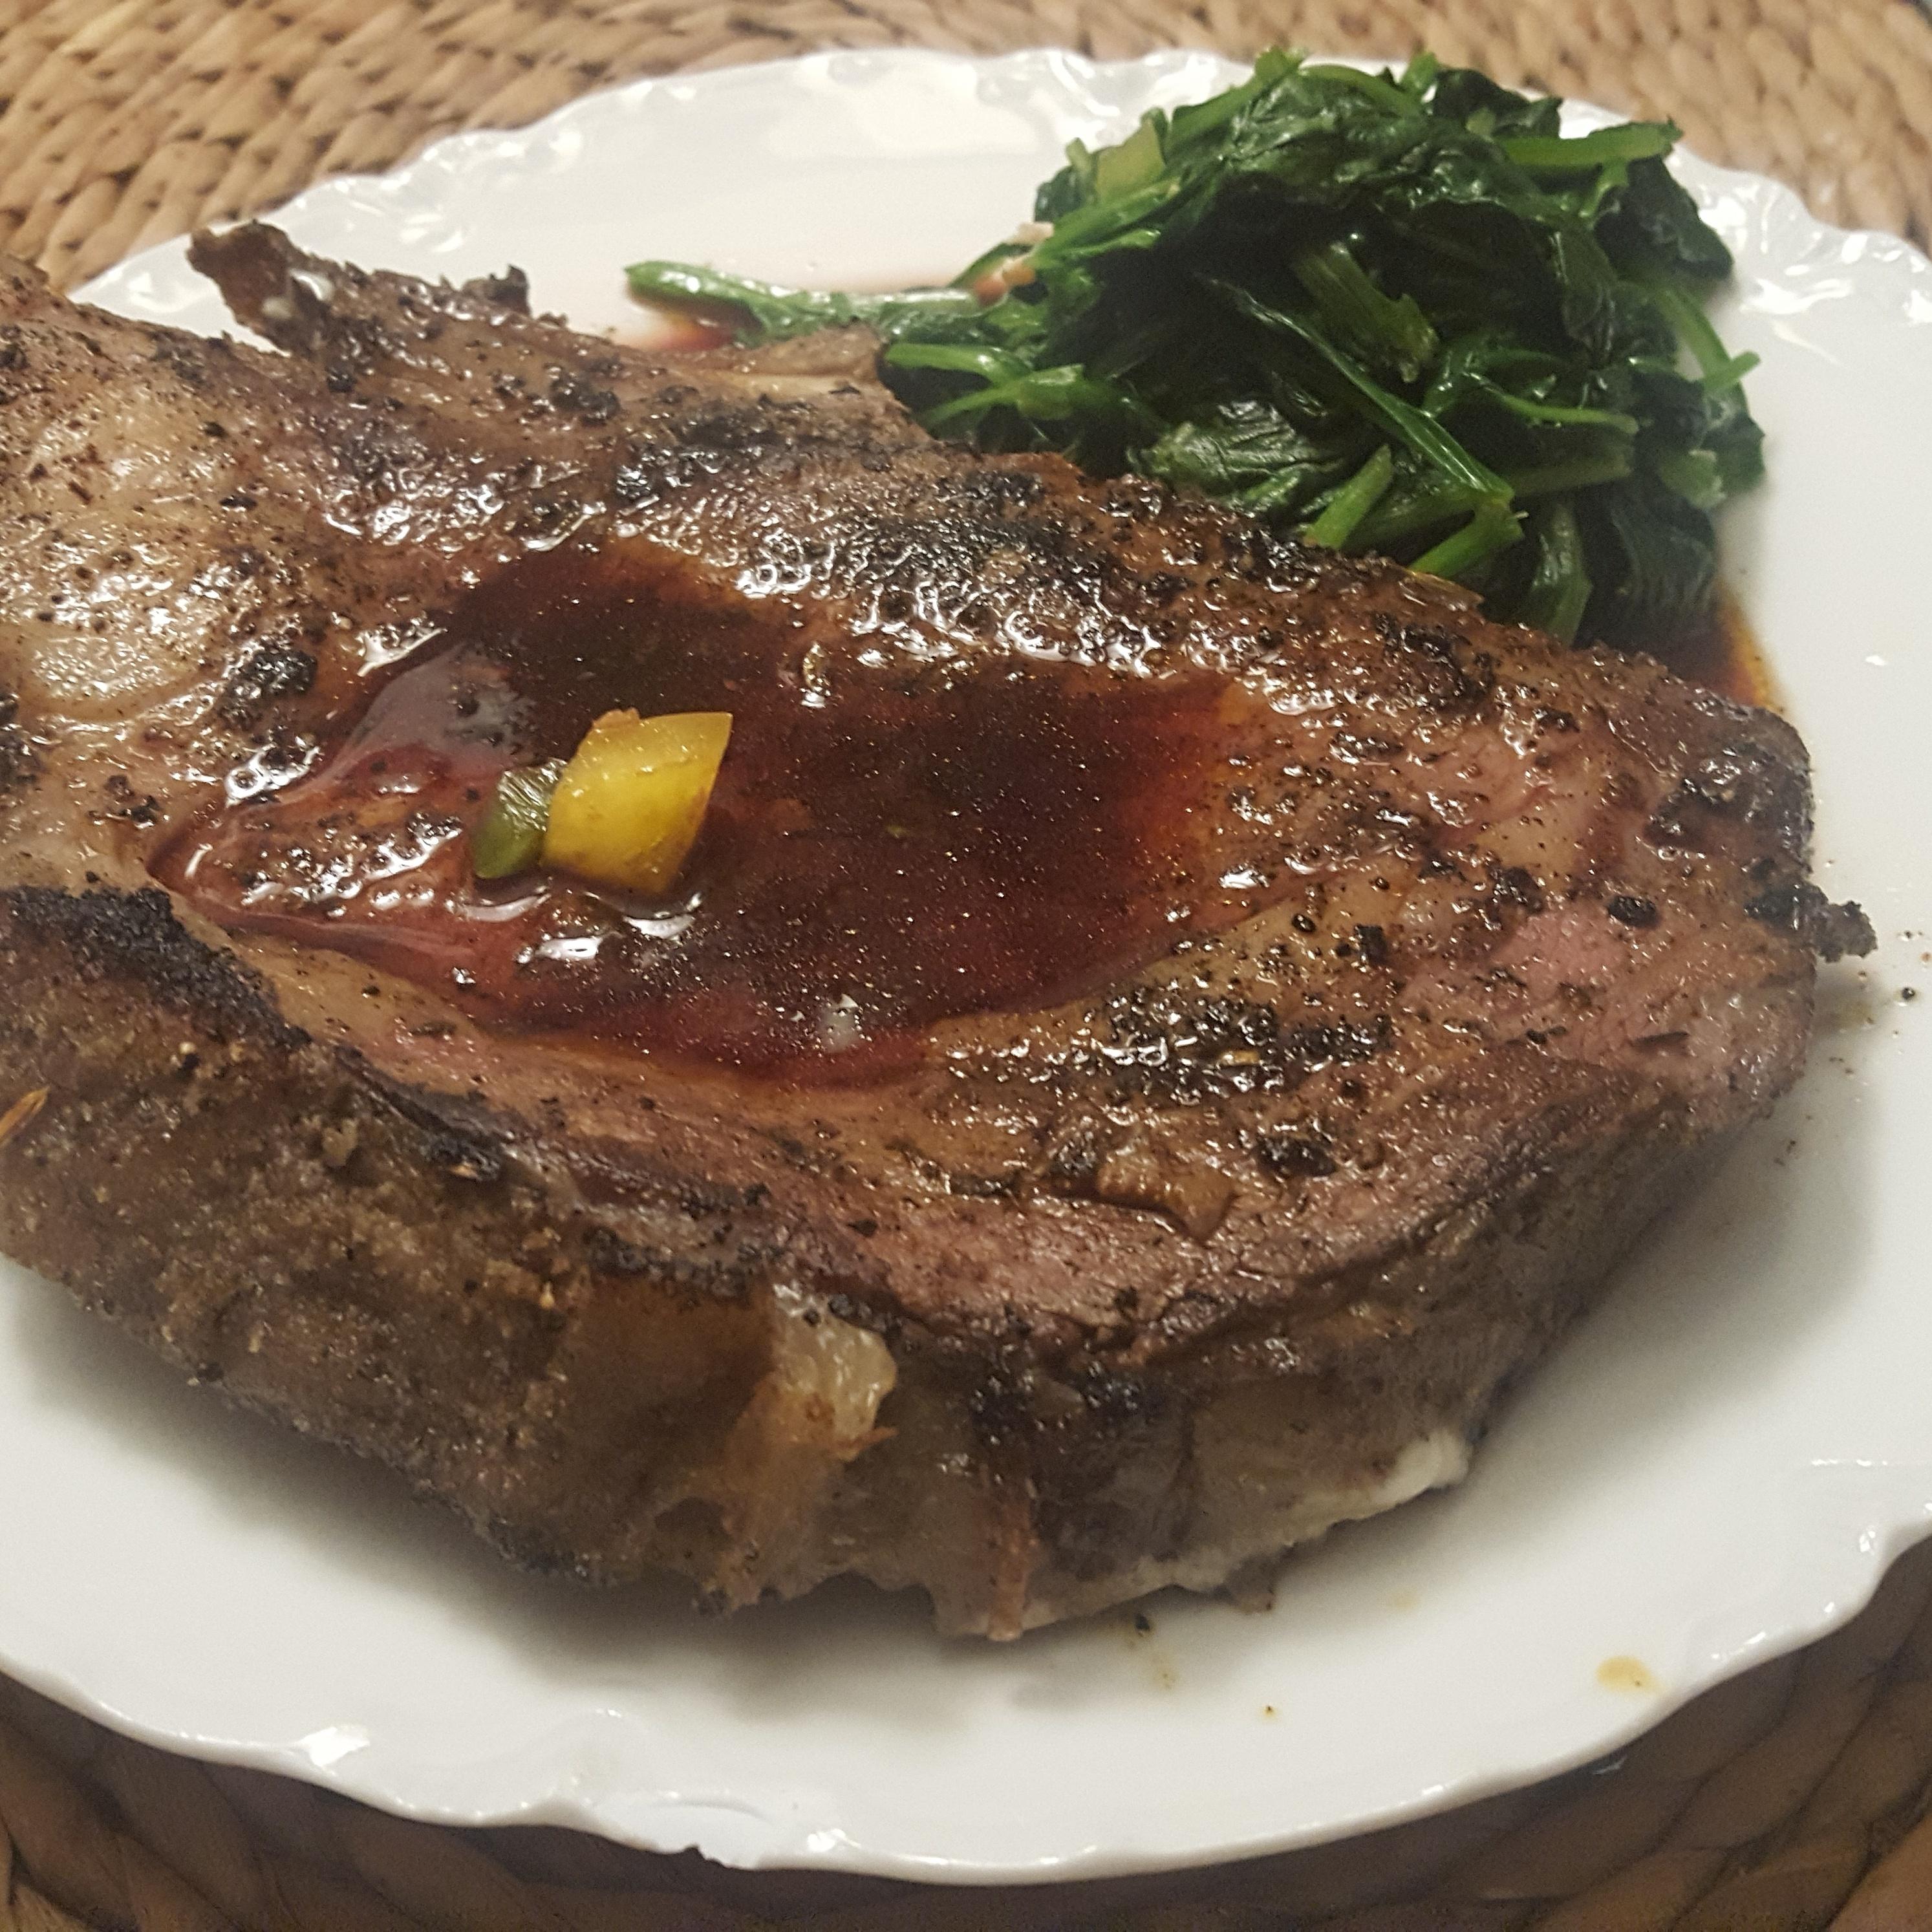 Thick Cut Blackened Prime Rib Steak Boar S Head Restaurant Pcb Dine At Boar S Head Pcb